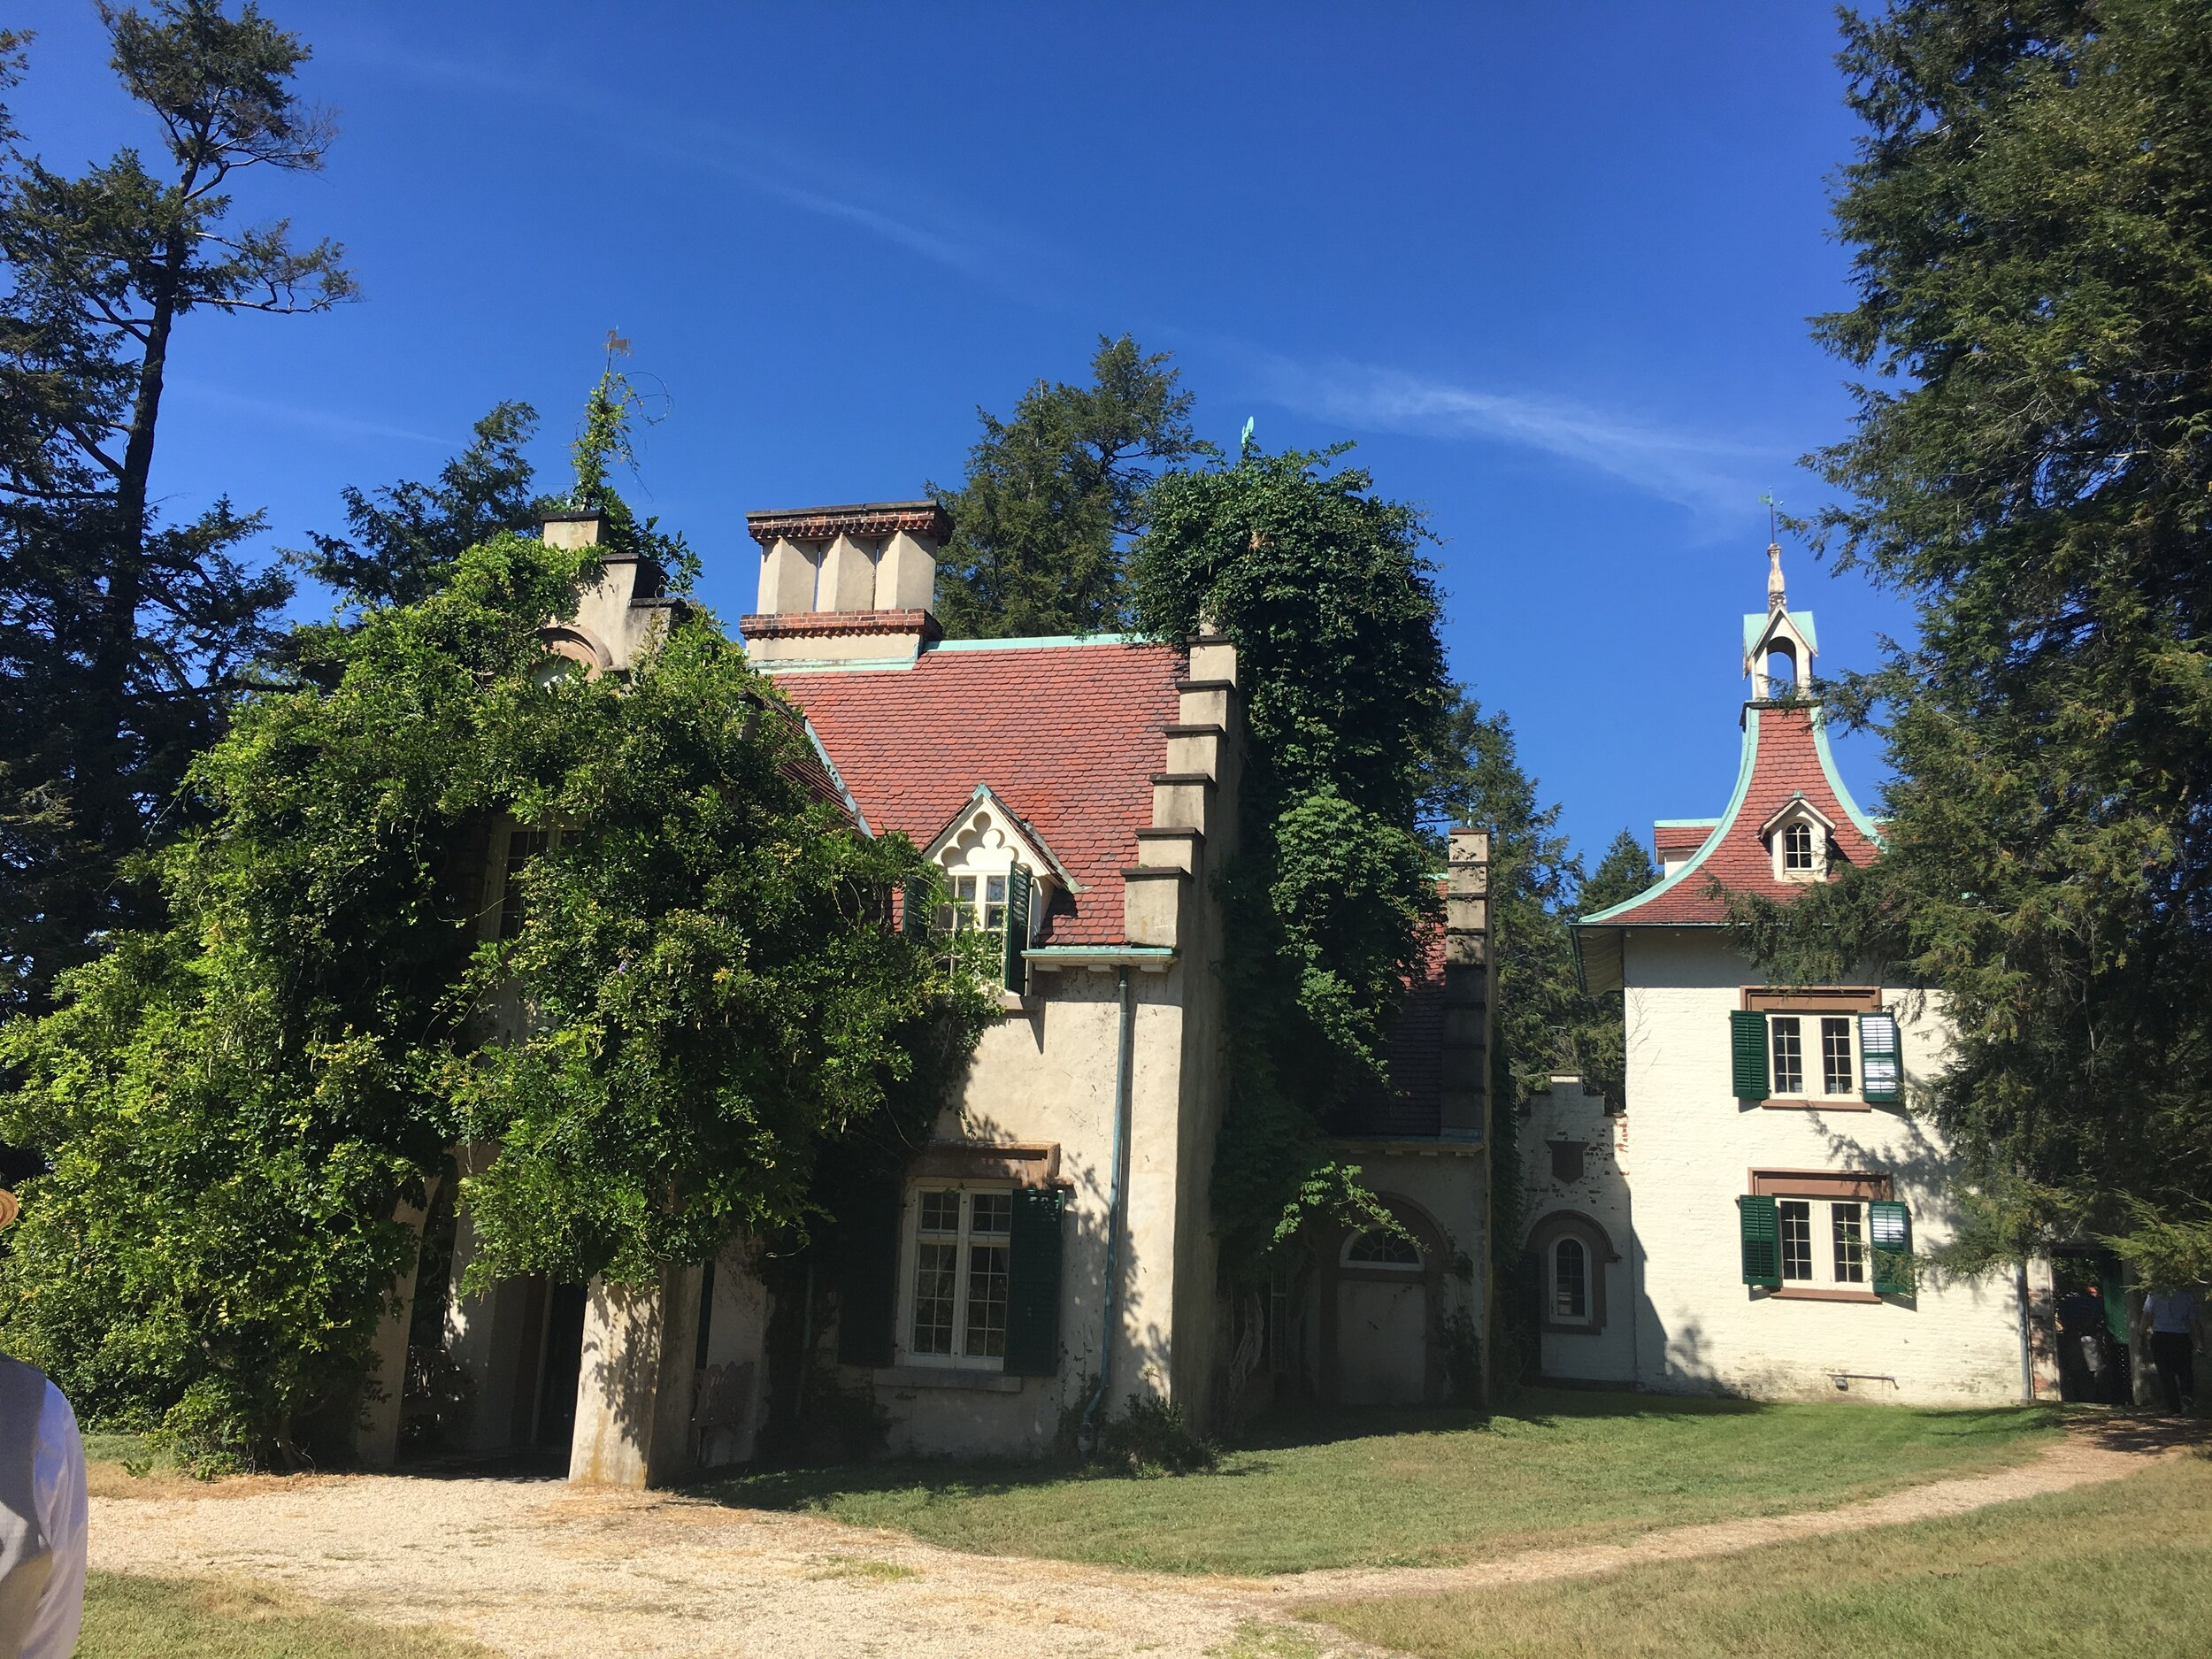 Sunnyside—Home of Washington Irving in Irvington (Tarrytown)